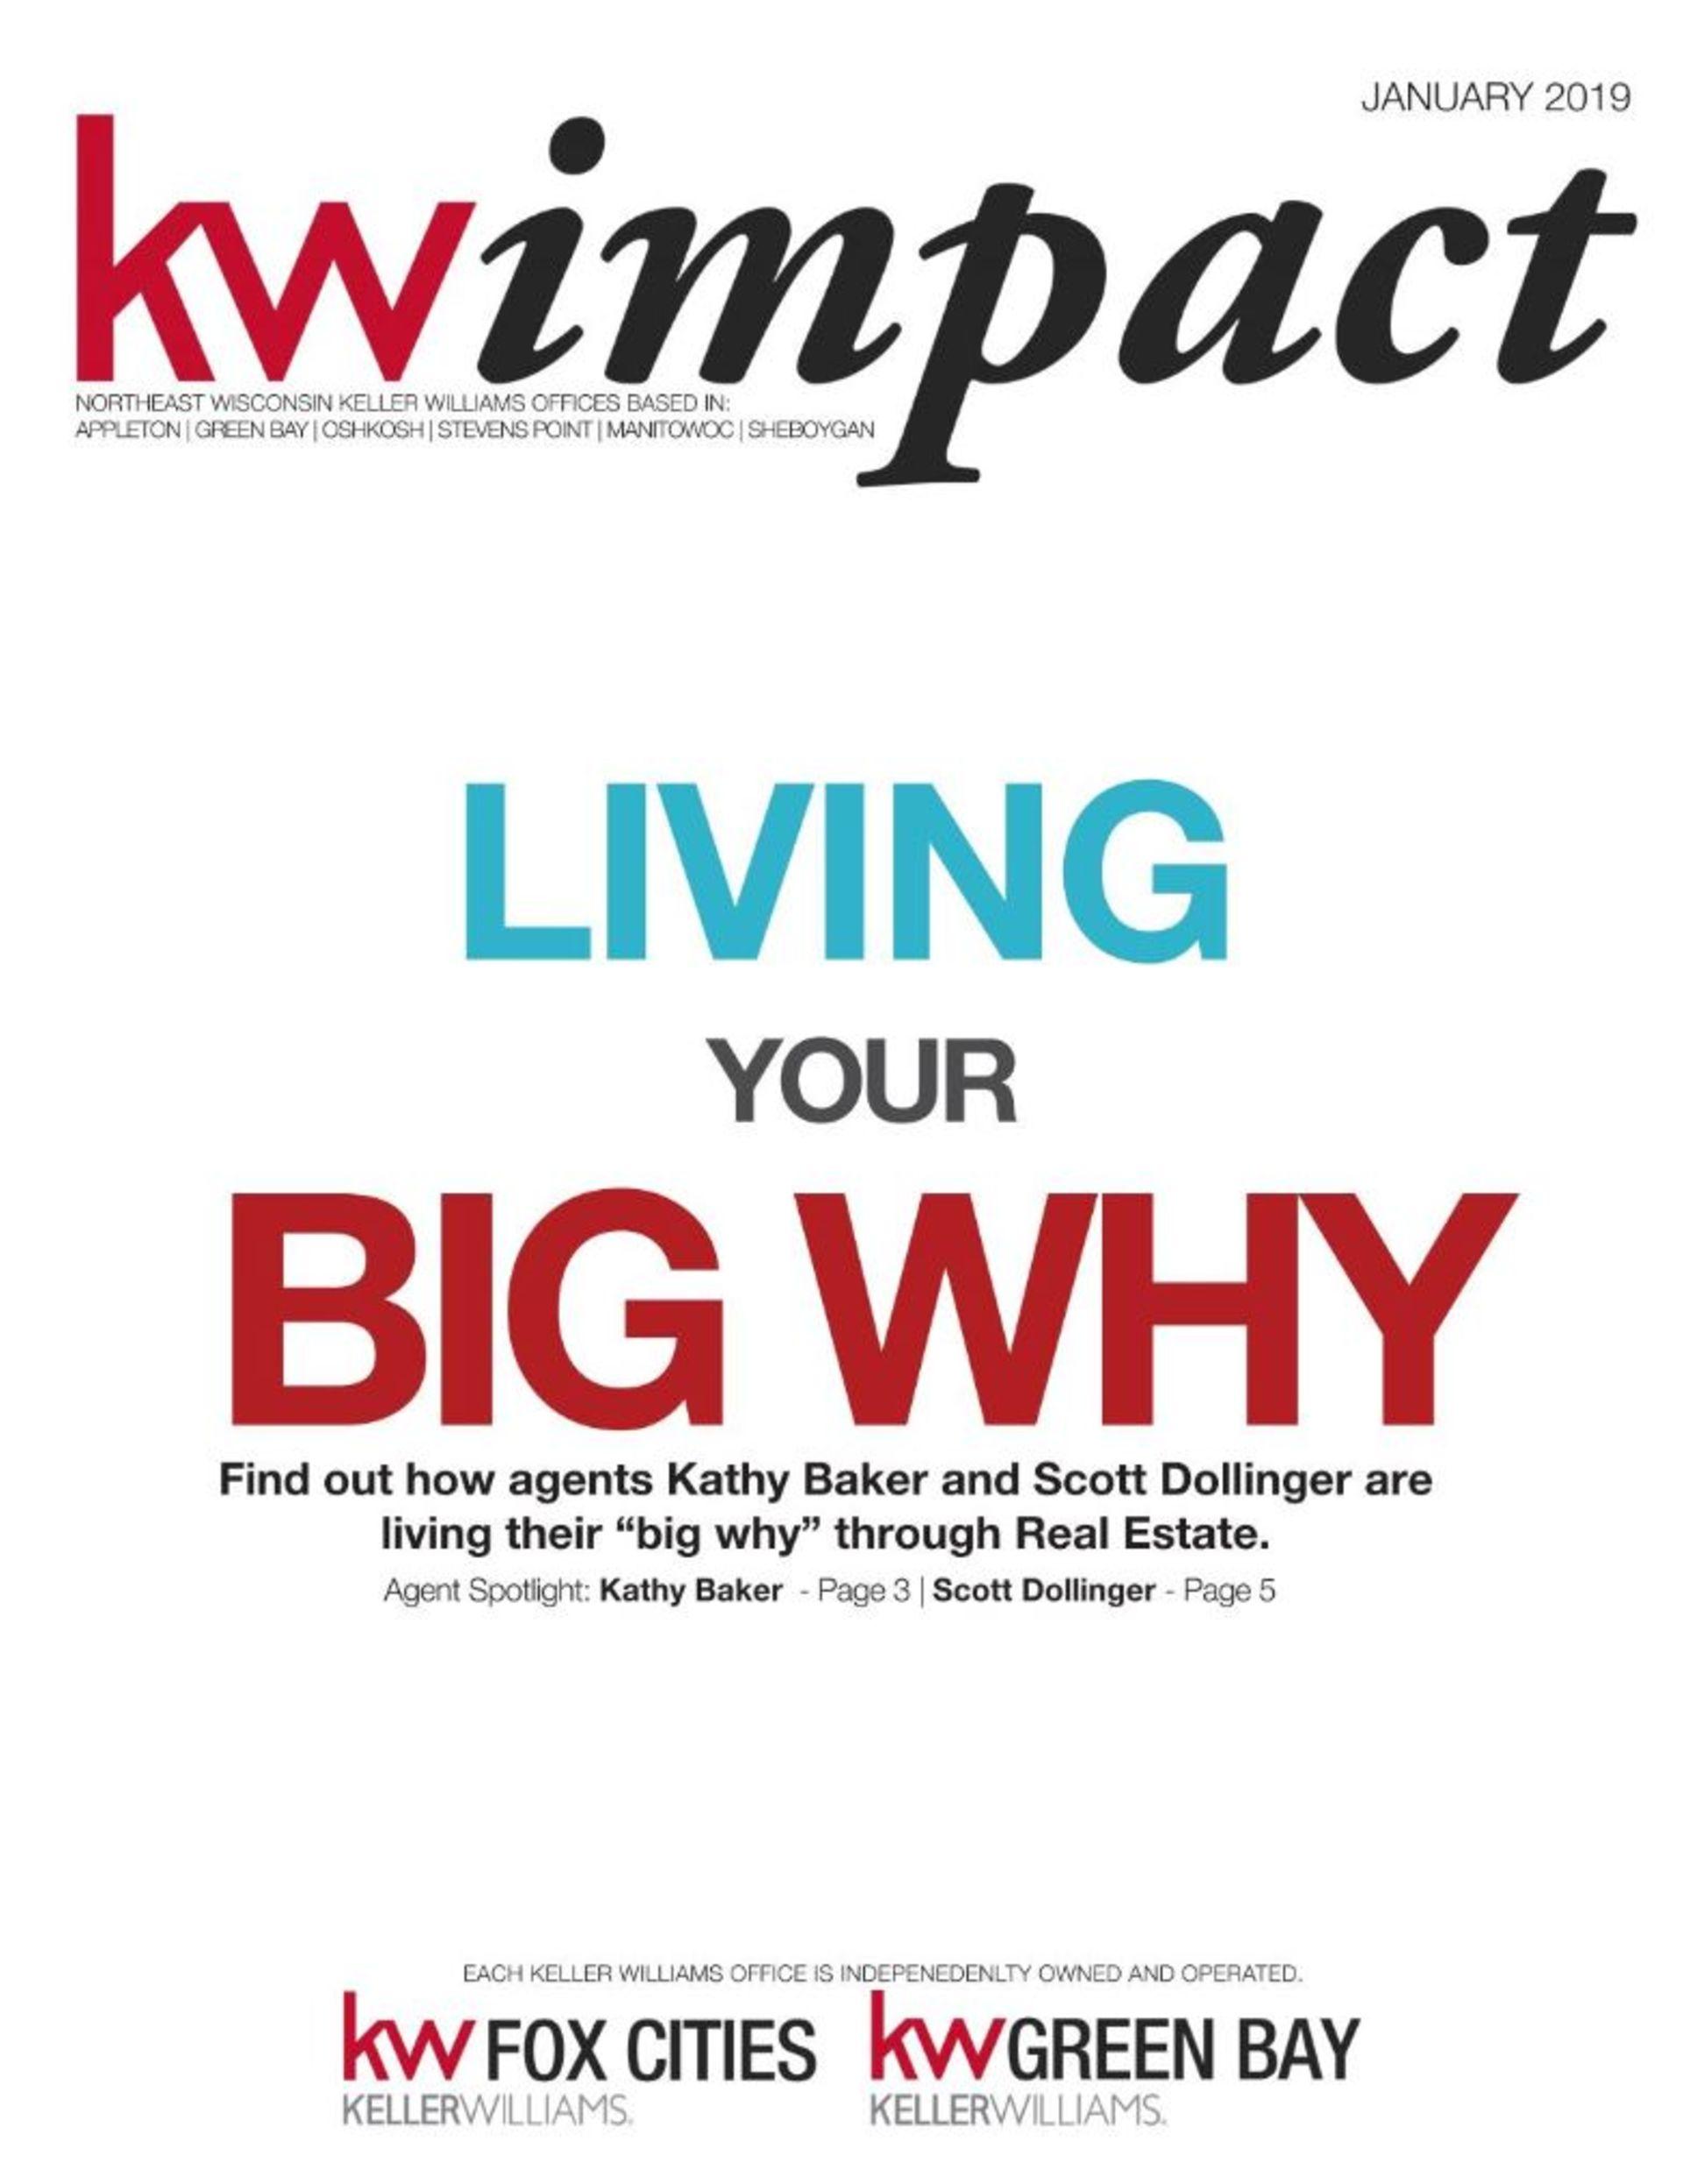 KW-Impact-January 2019